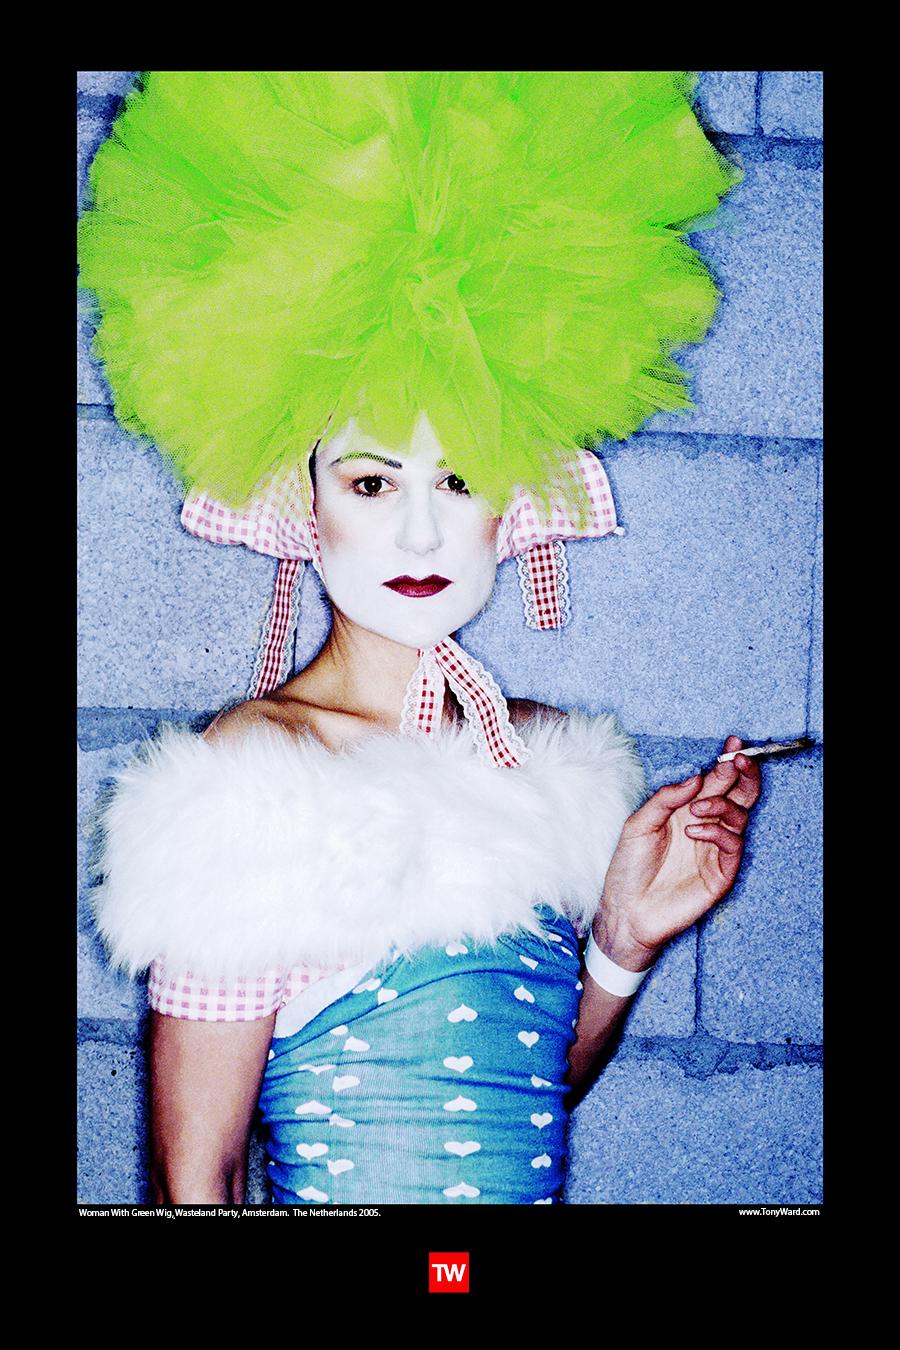 Tony_Ward_photography_Wasteland_party_amsterdam_documentary_the_netherlands_fetish_fashion_wigs_makeup_marajuana_poster